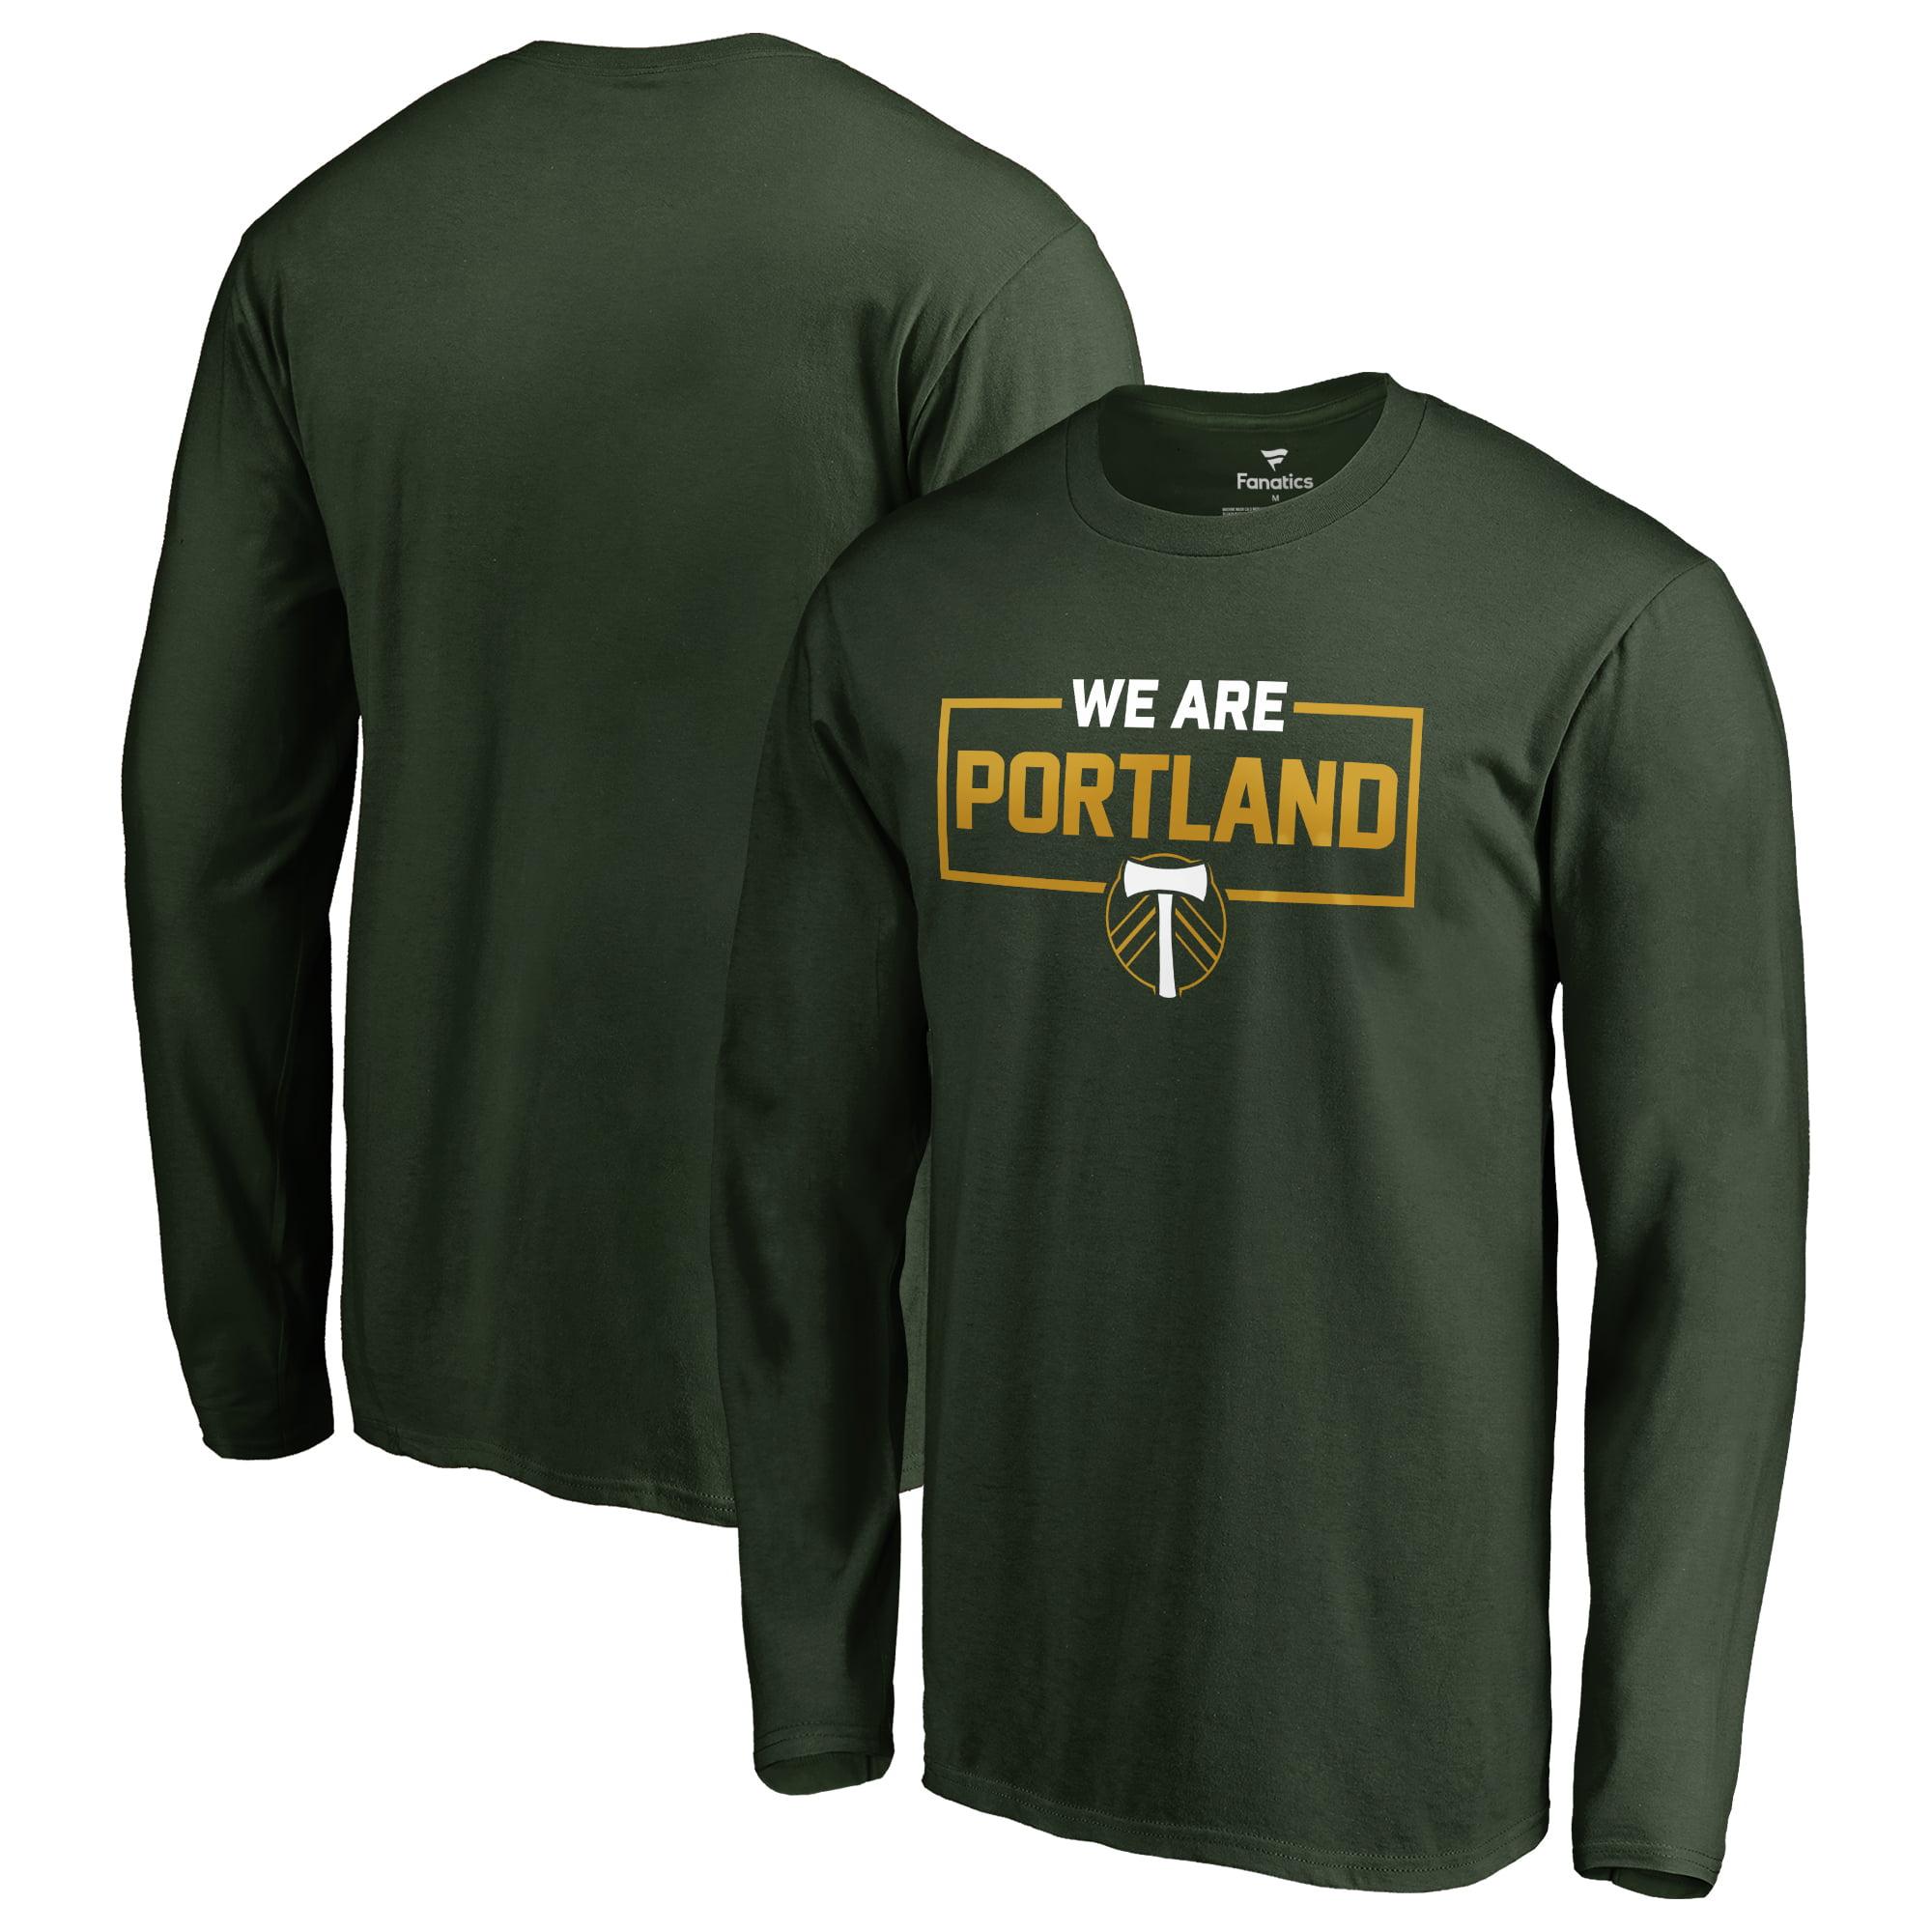 Portland Timbers Fanatics Branded We Are Long Sleeve T-Shirt - Green